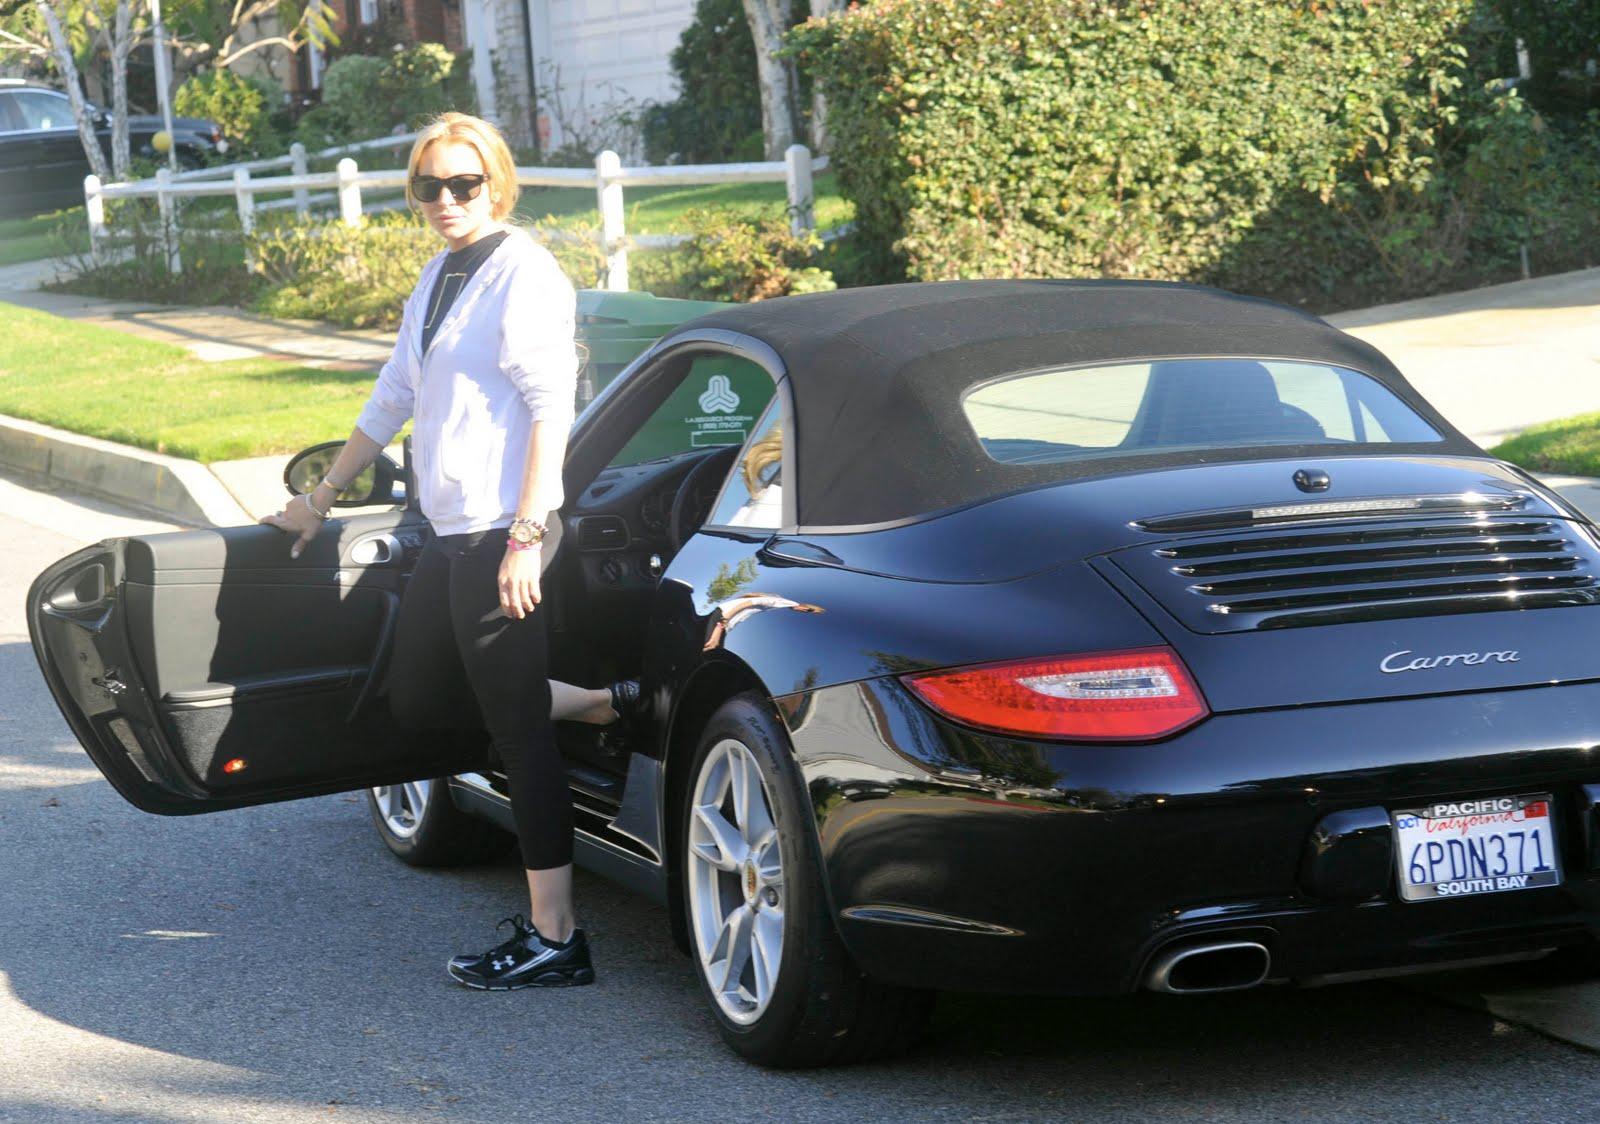 http://1.bp.blogspot.com/-zcQ8dRcSNd8/Td2n8qS9EEI/AAAAAAAAA24/5p5VaY3kAIU/s1600/celebrity-cars-2LL.jpg